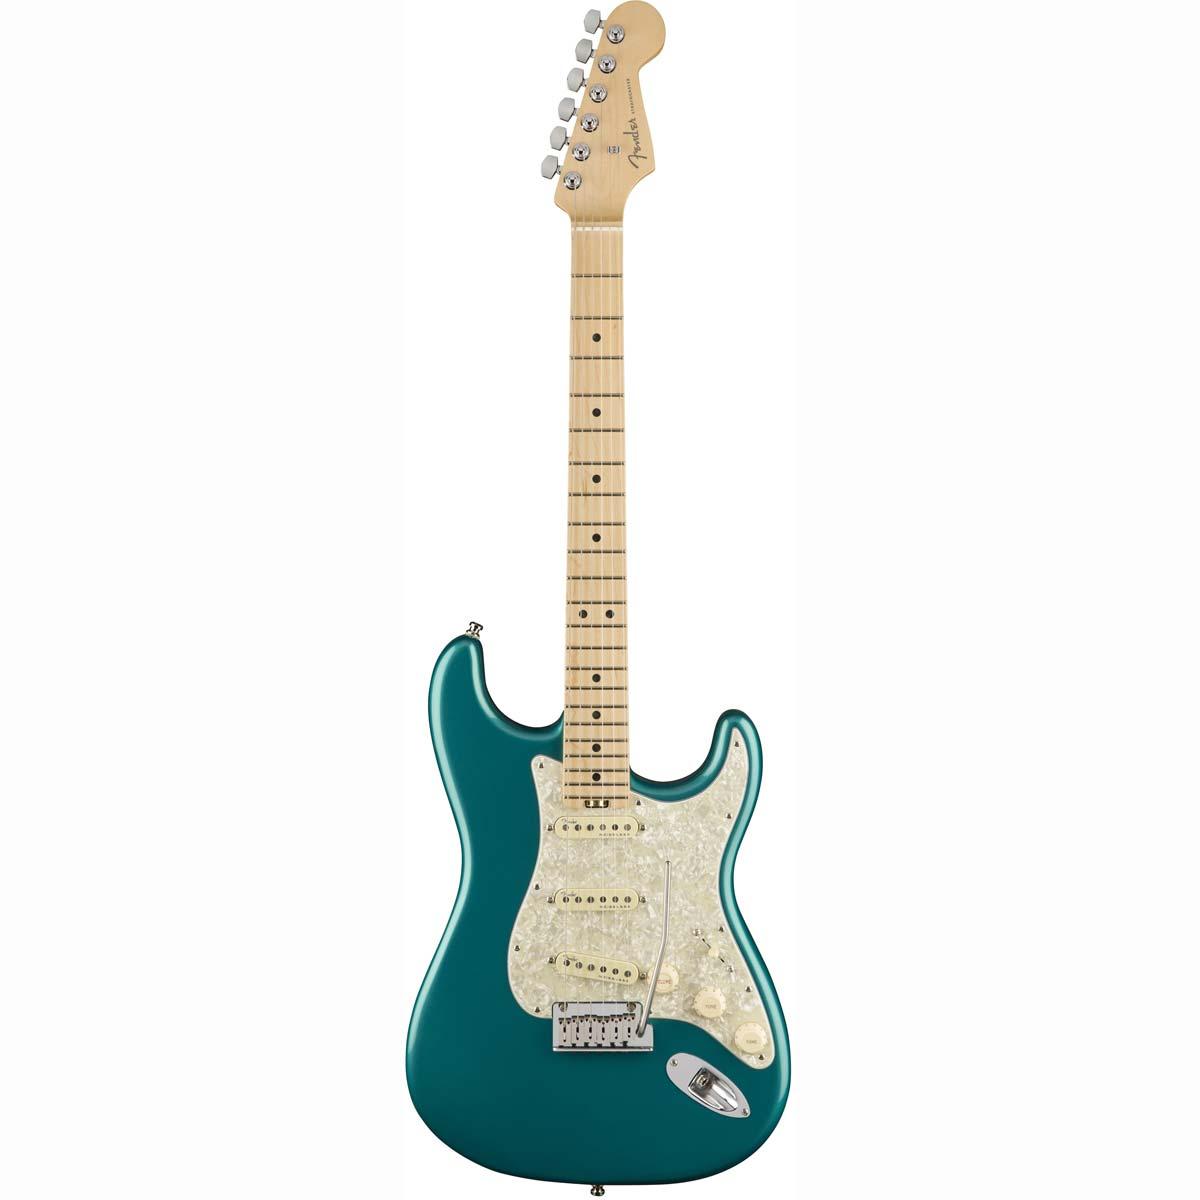 Fender American Elite Stratocaster, MN, OCT el-guitar ocean turquoise